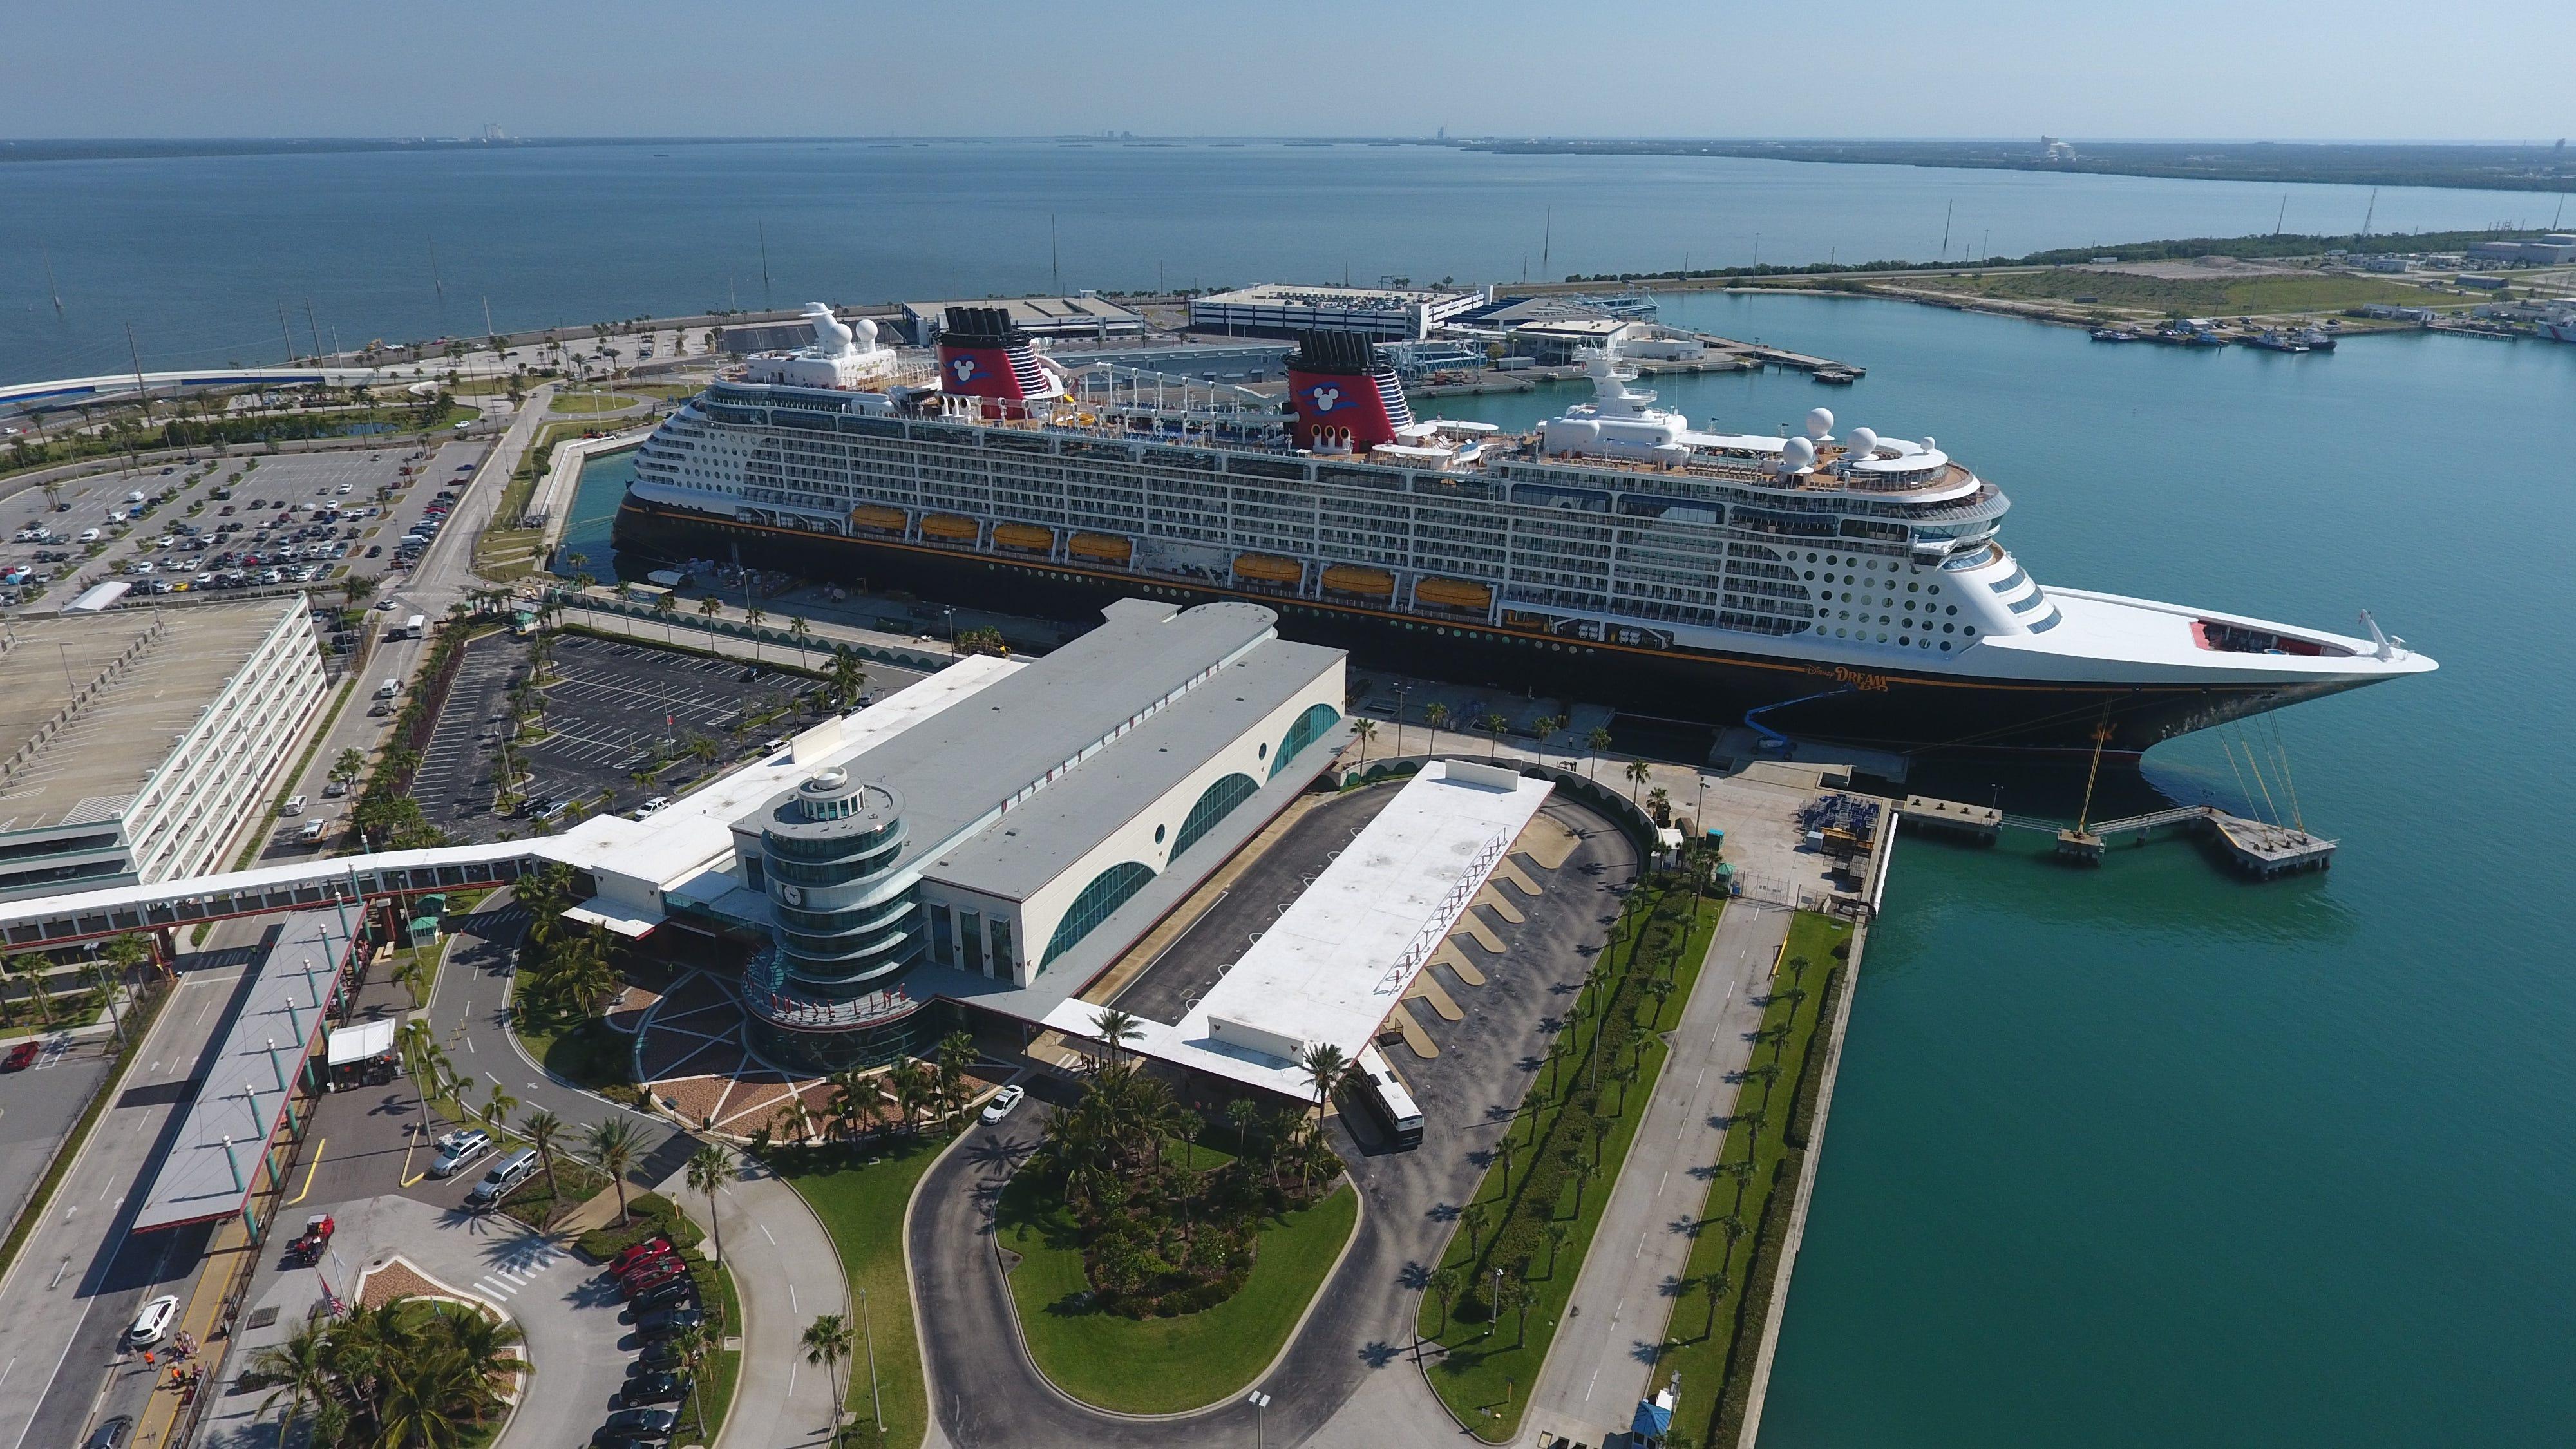 Coronavirus Last Disney Cruise Set To Sail Before Operations Cease